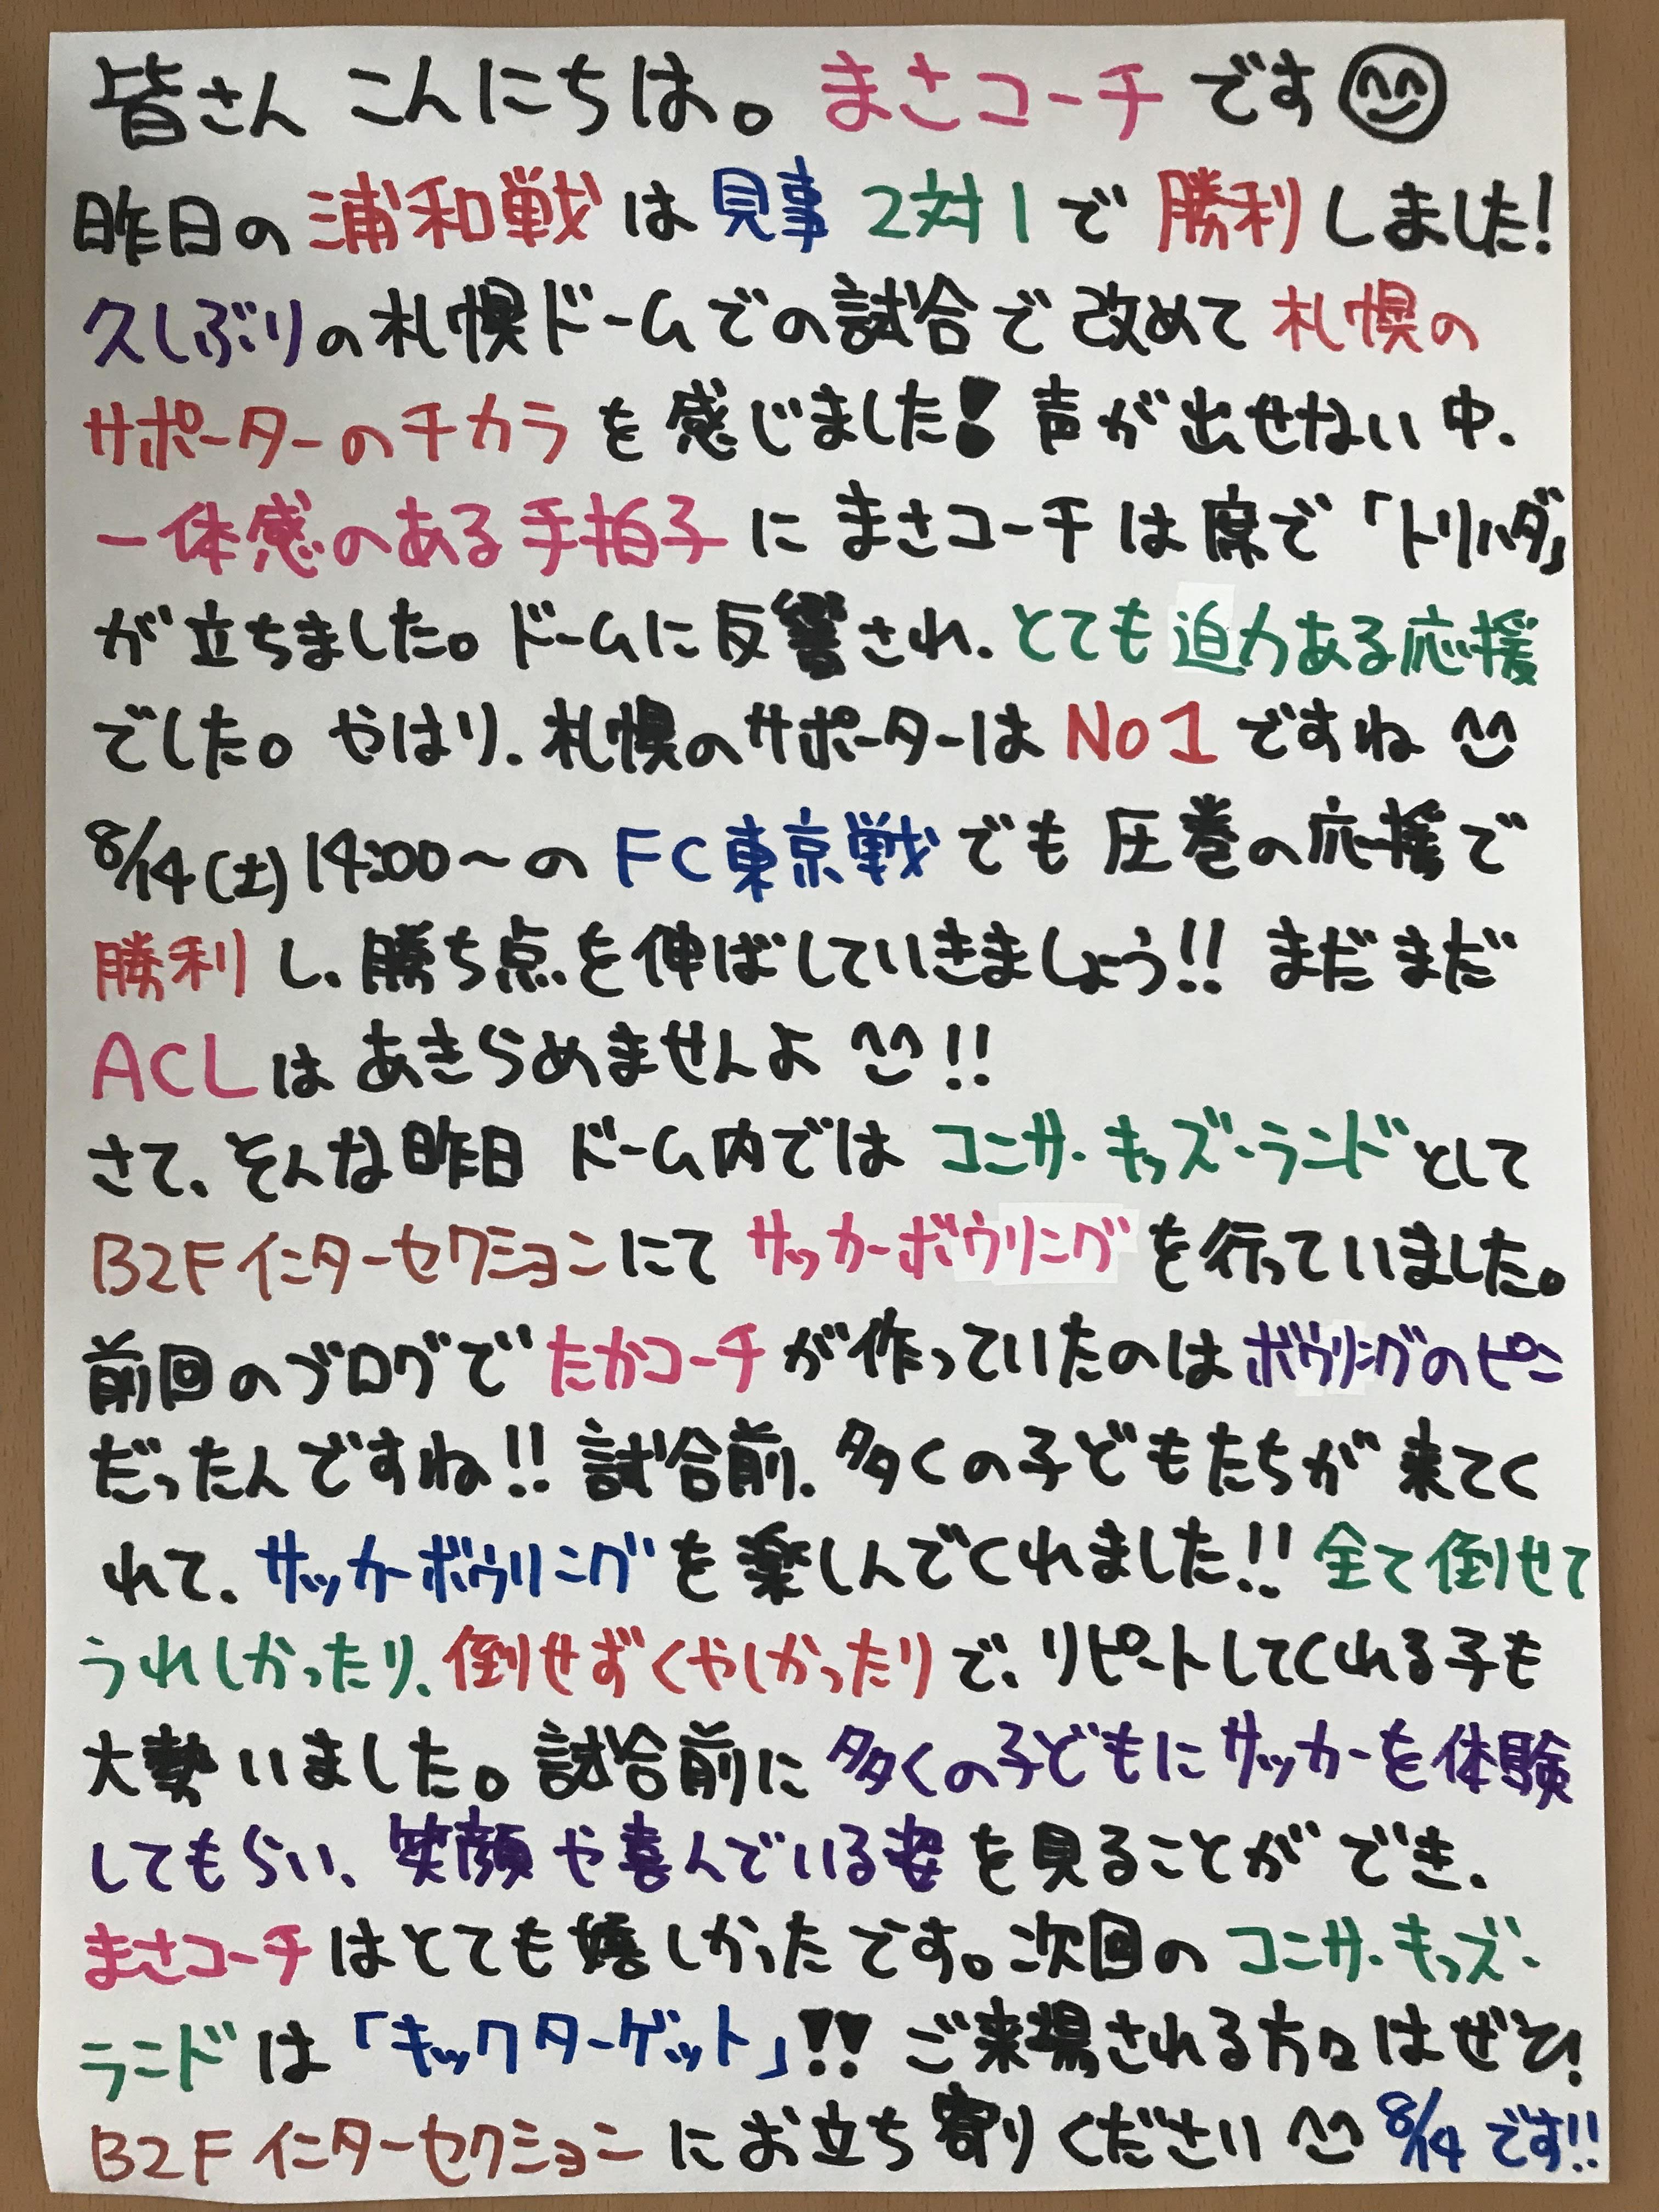 https://chsc.jp/news/up_images/%EF%BC%8327%281%29.jpg